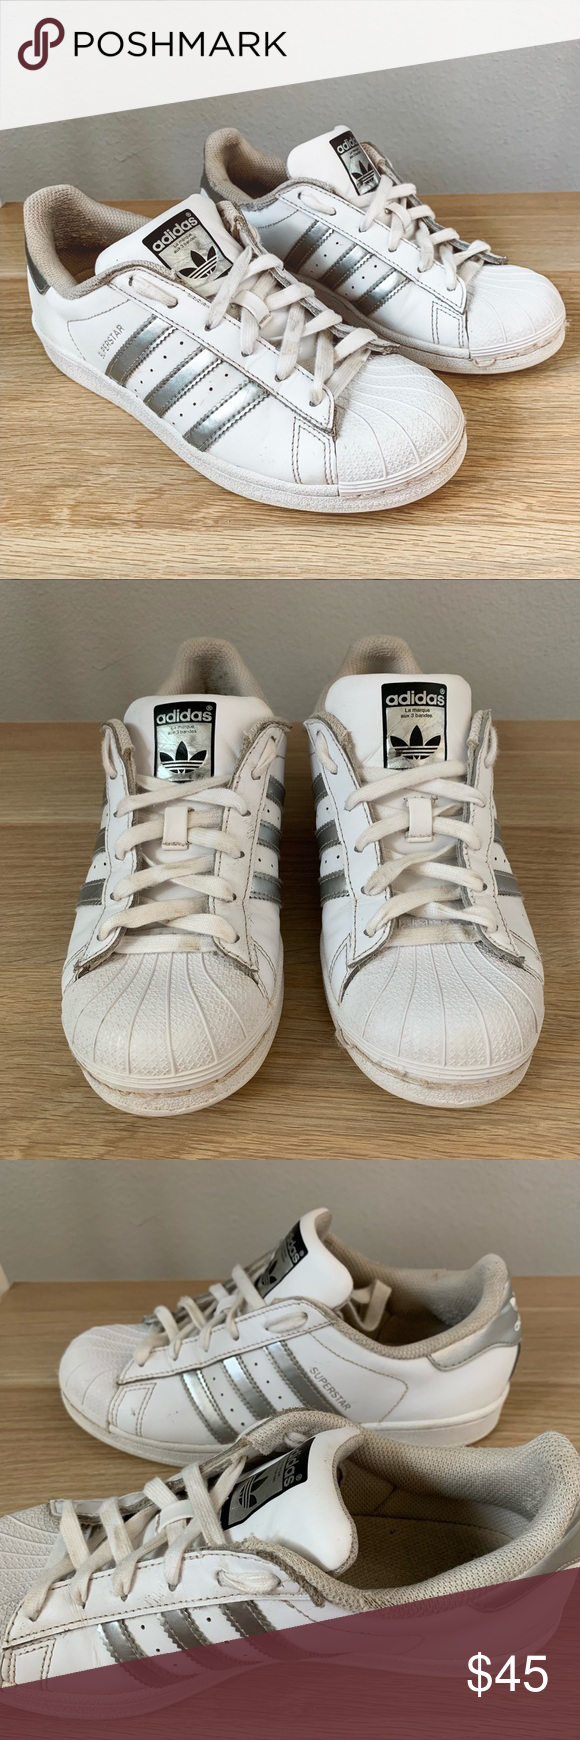 Adidas Silver Stripe Superstar Sneakers